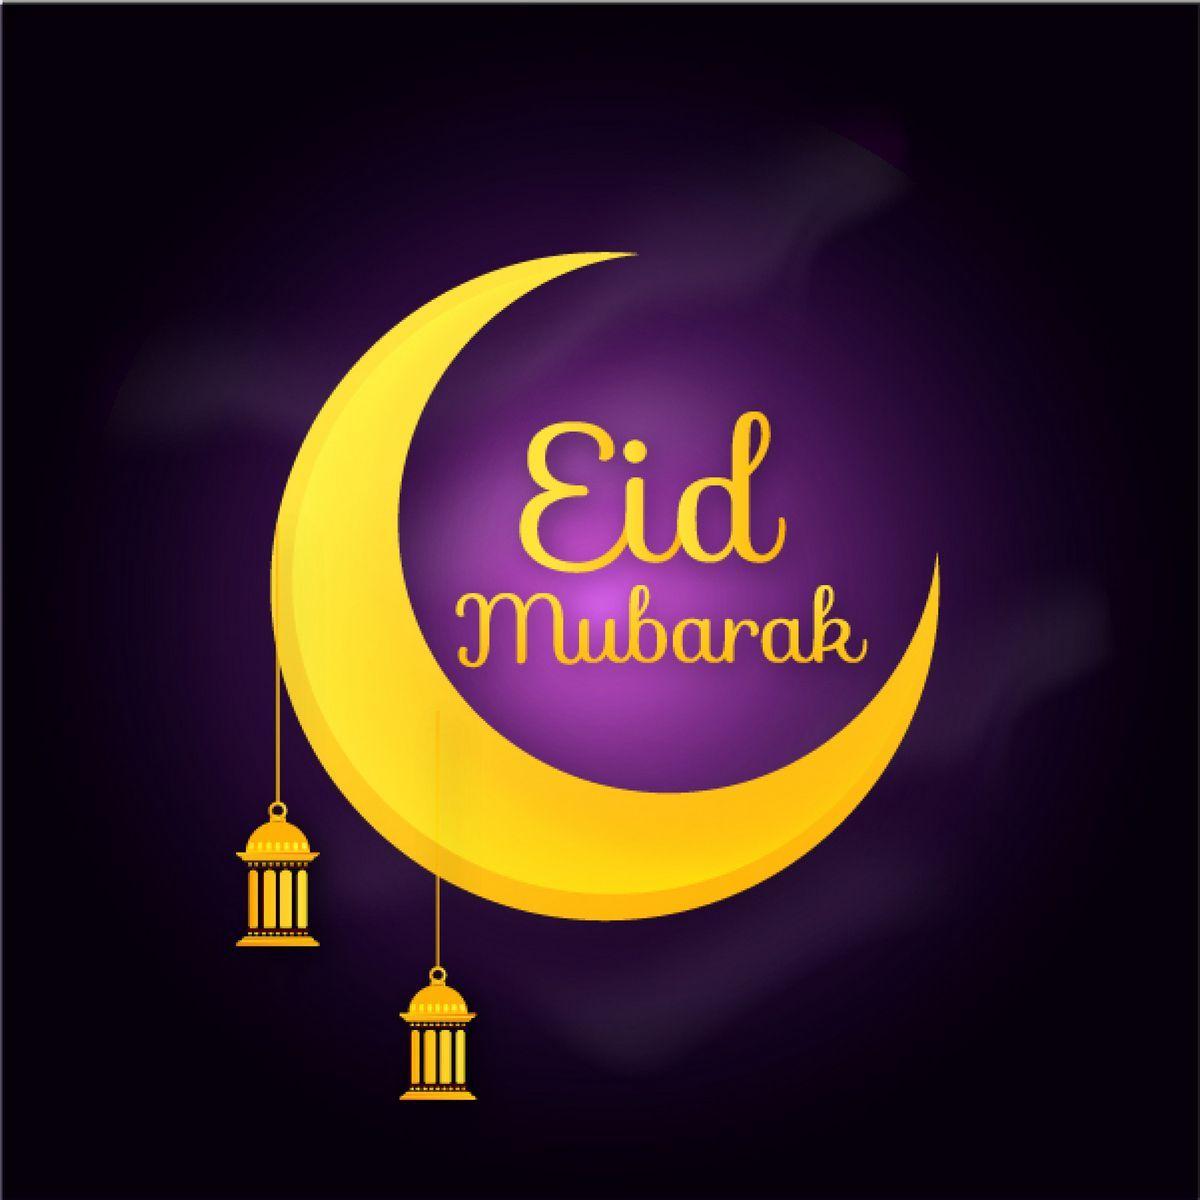 Advance Eid Mubarak 2019 Images Wallpapers Eid Al Fitr Tips 1200x1200